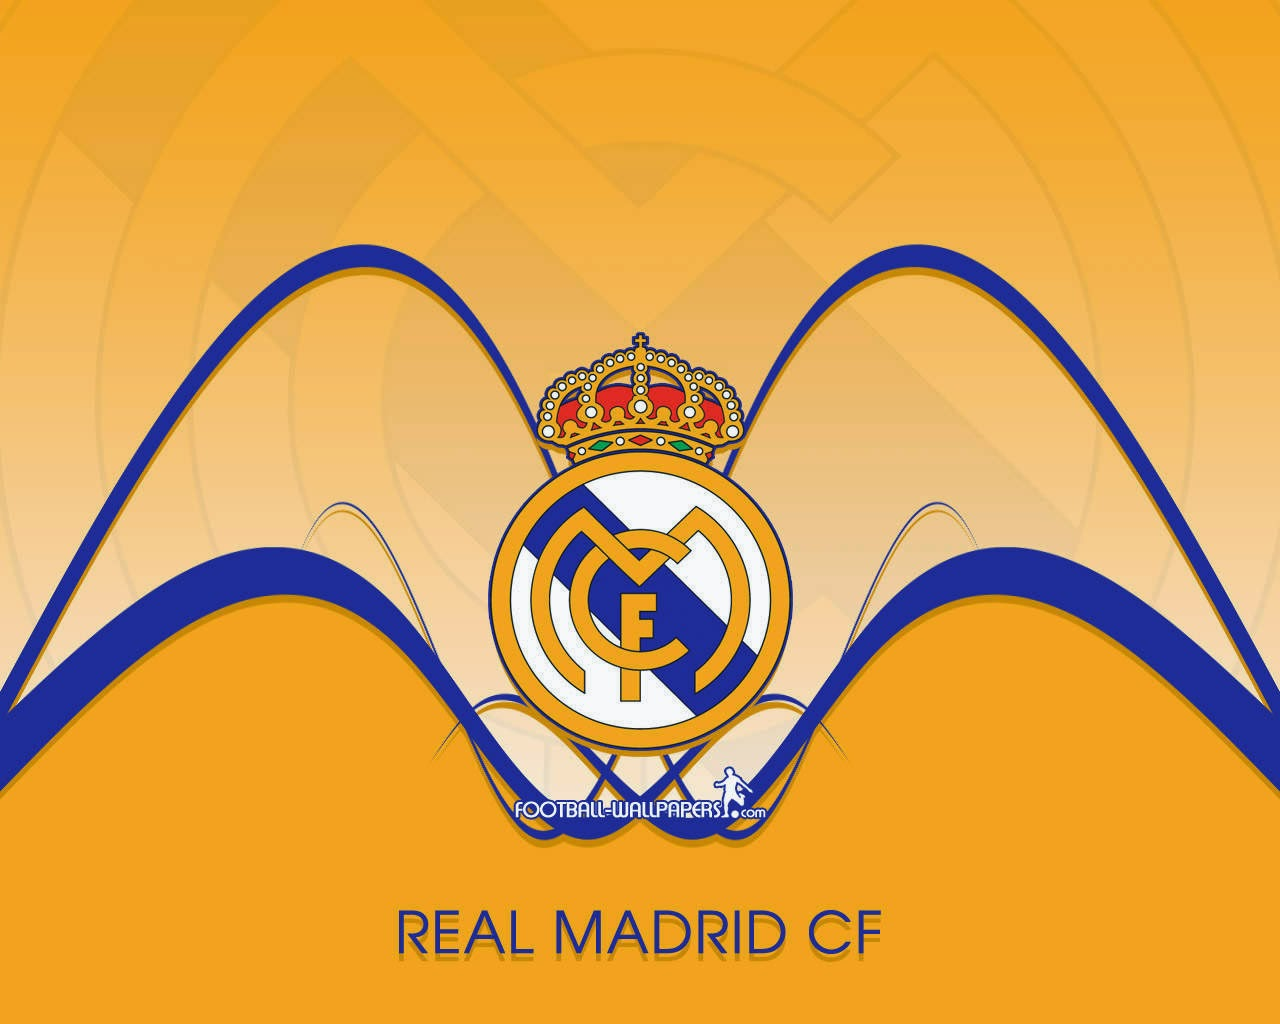 Wallpaper real madrid for windows xp -  Real Madrid Football Club Wallpaper